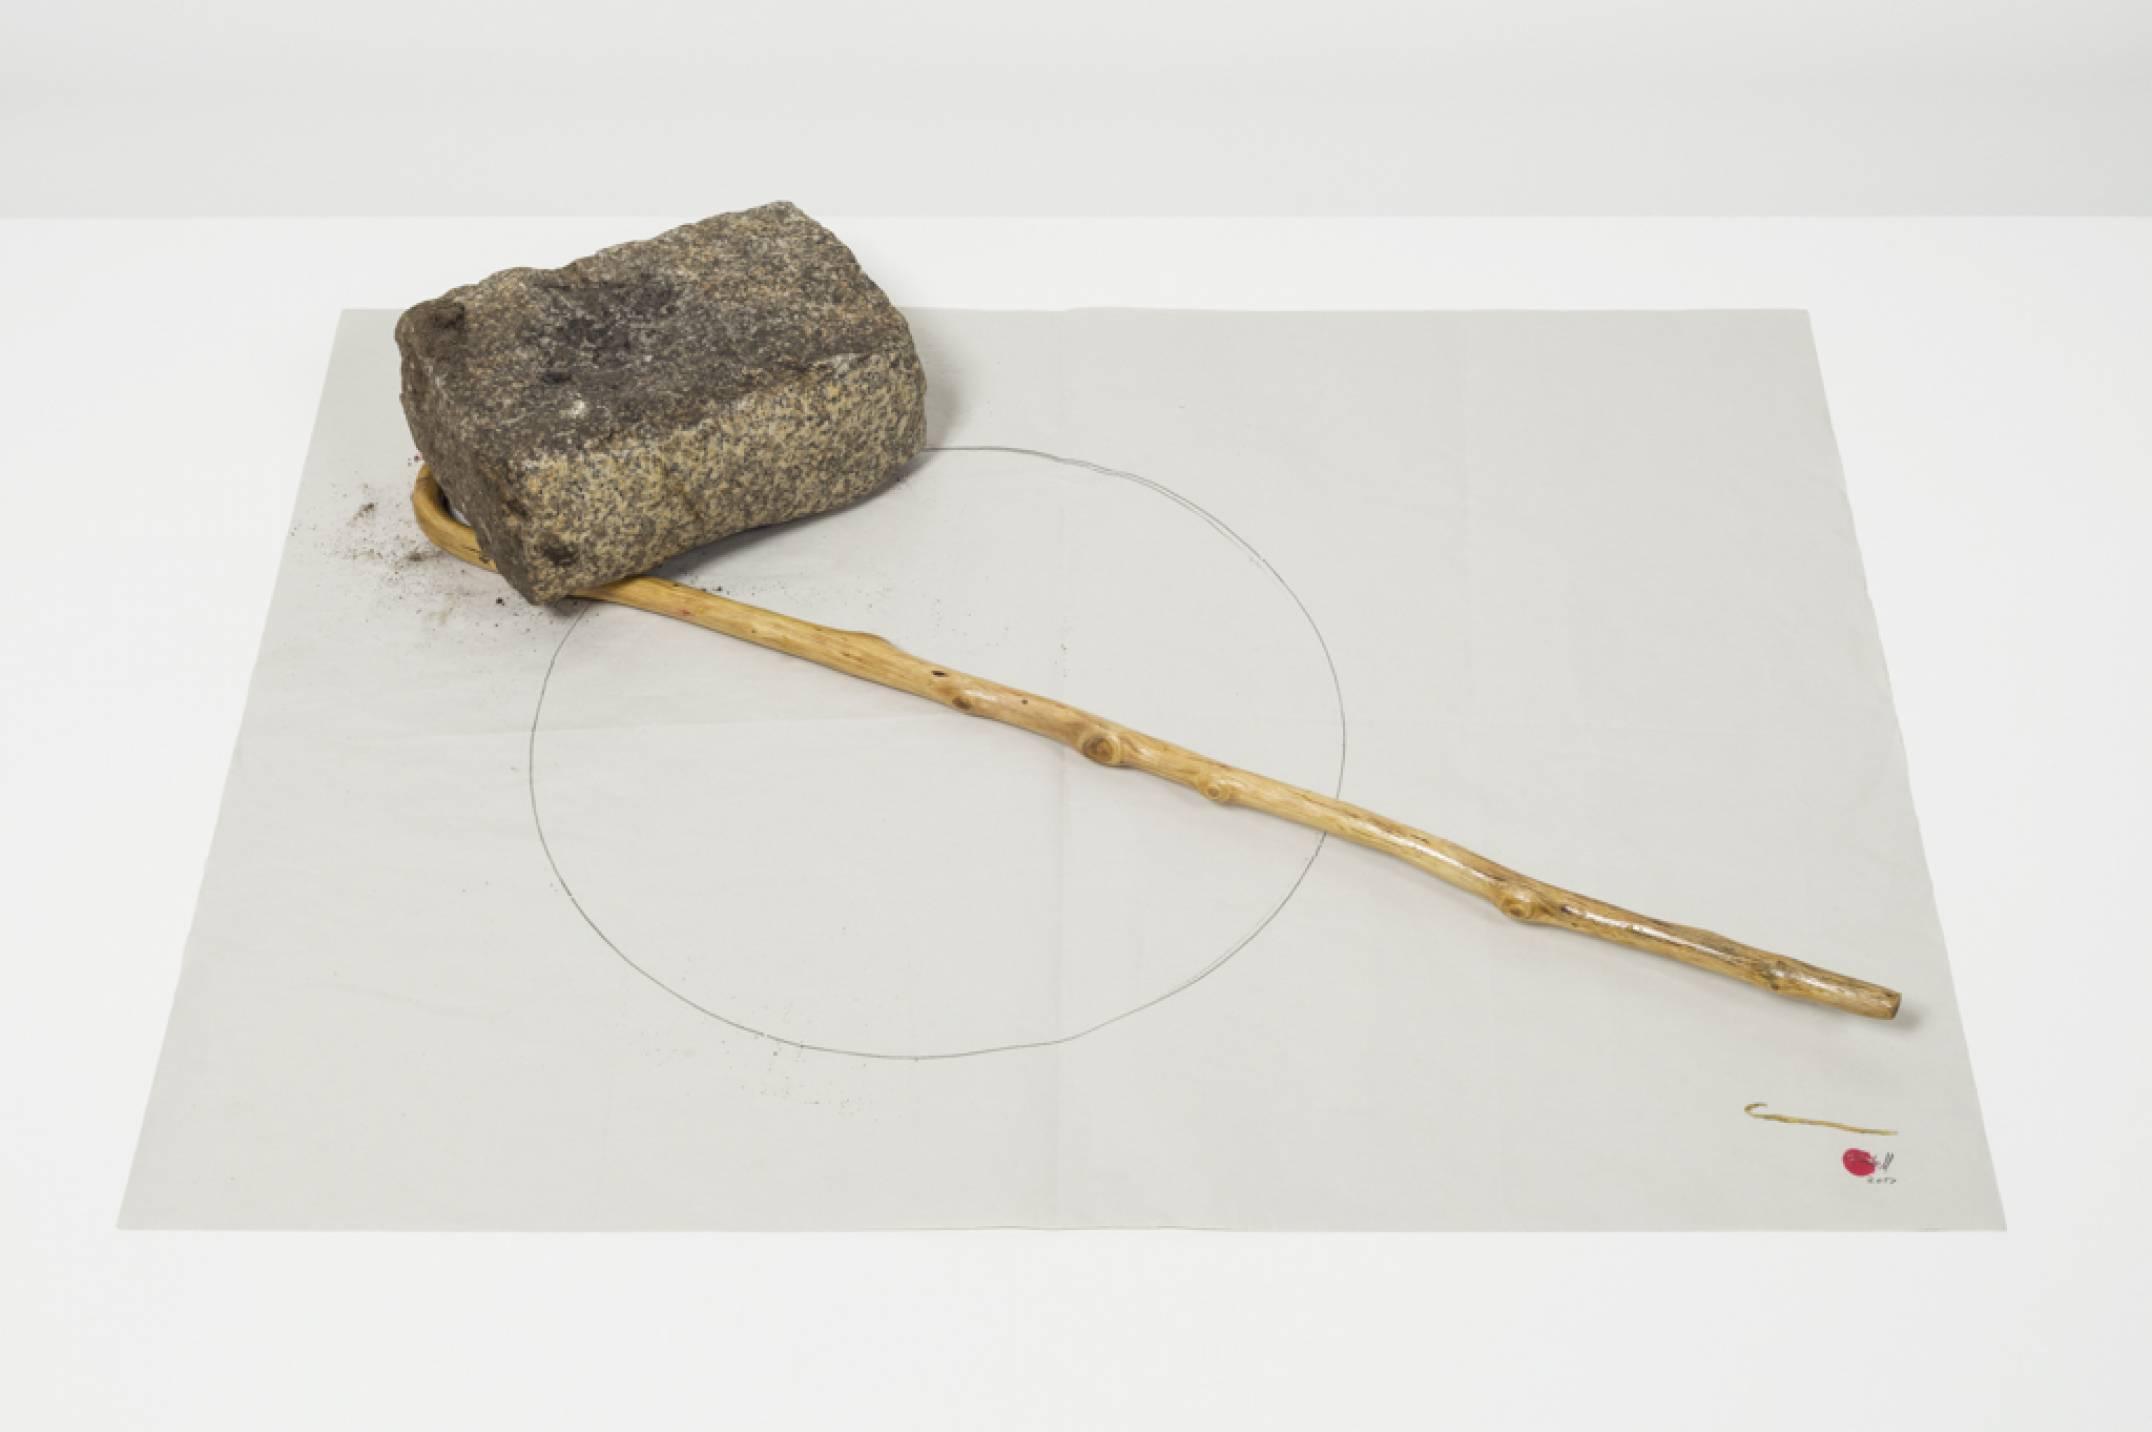 Paulo Nazareth, <em>OLD</em>, 2017, pencil on paper, stone, stick, 12,7 × 94 × 70 cm - Mendes Wood DM